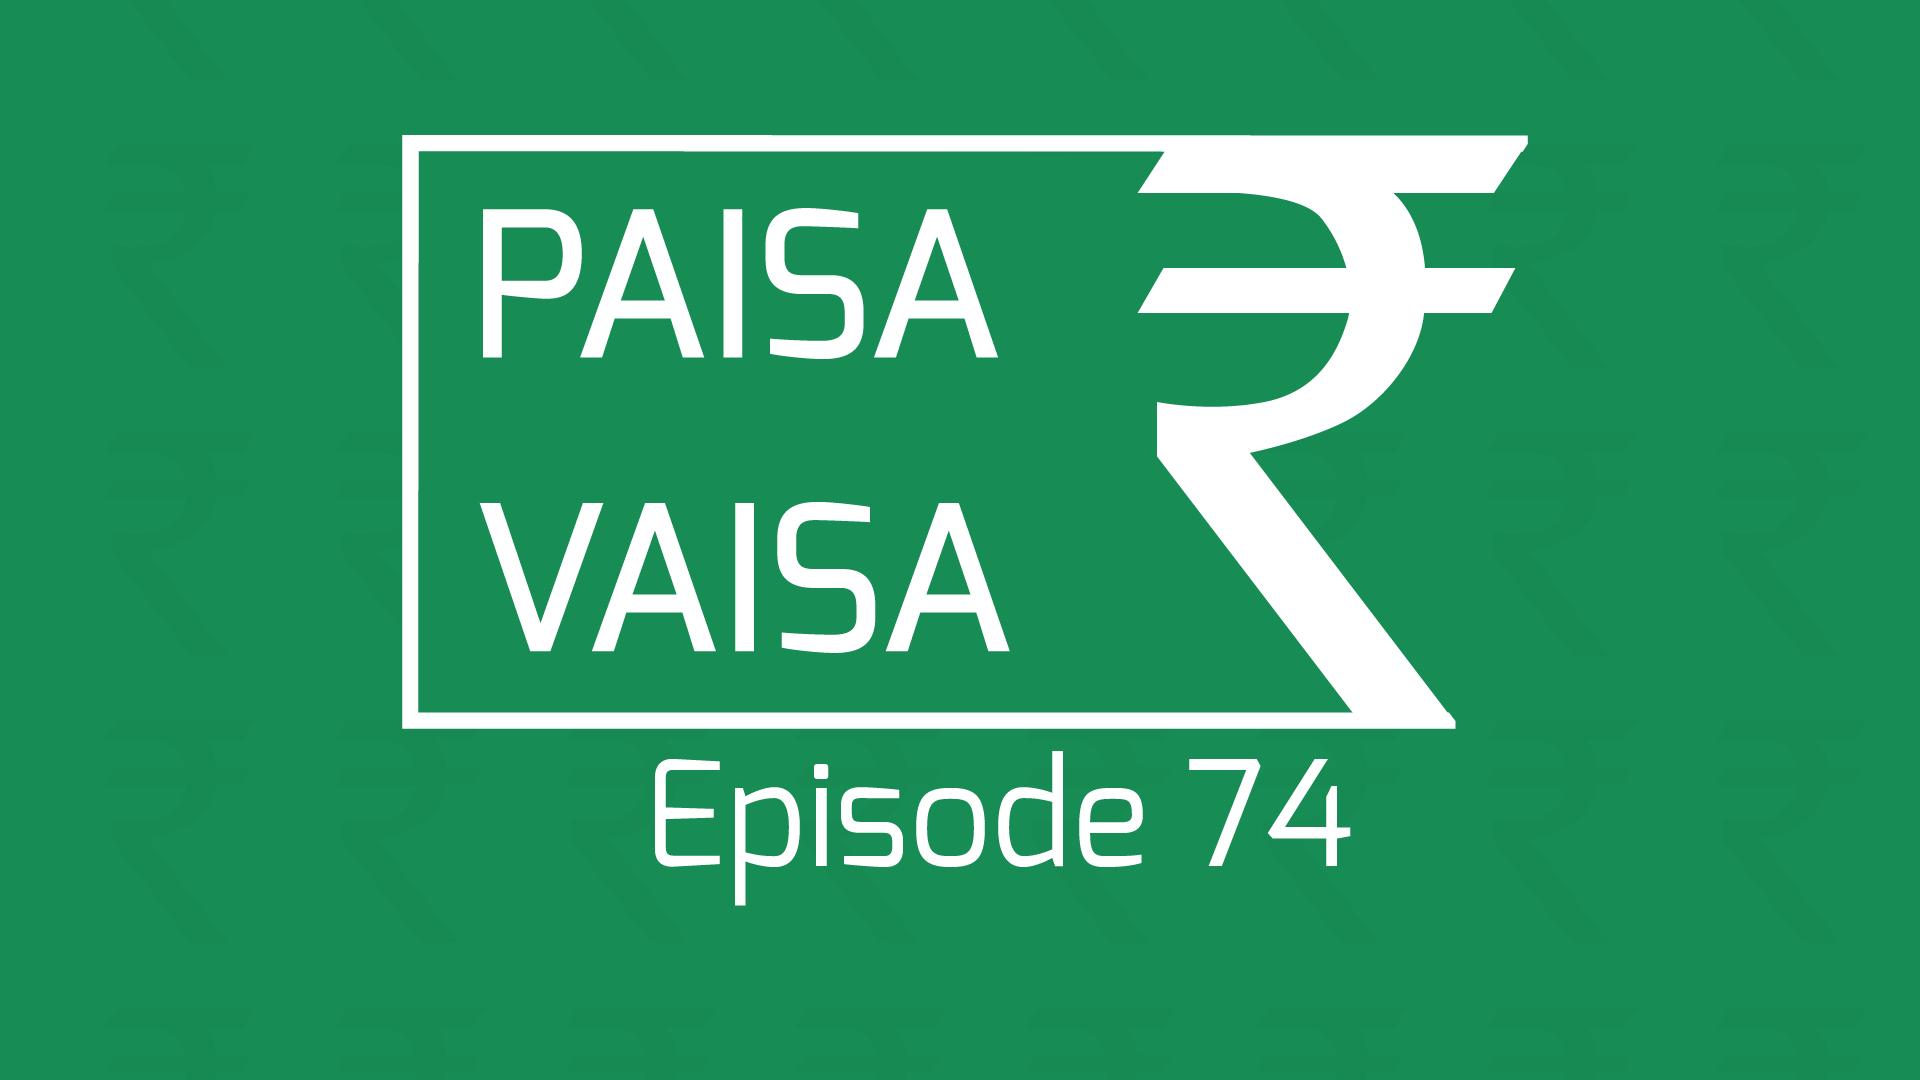 PaisaVaisaEpisode74.png